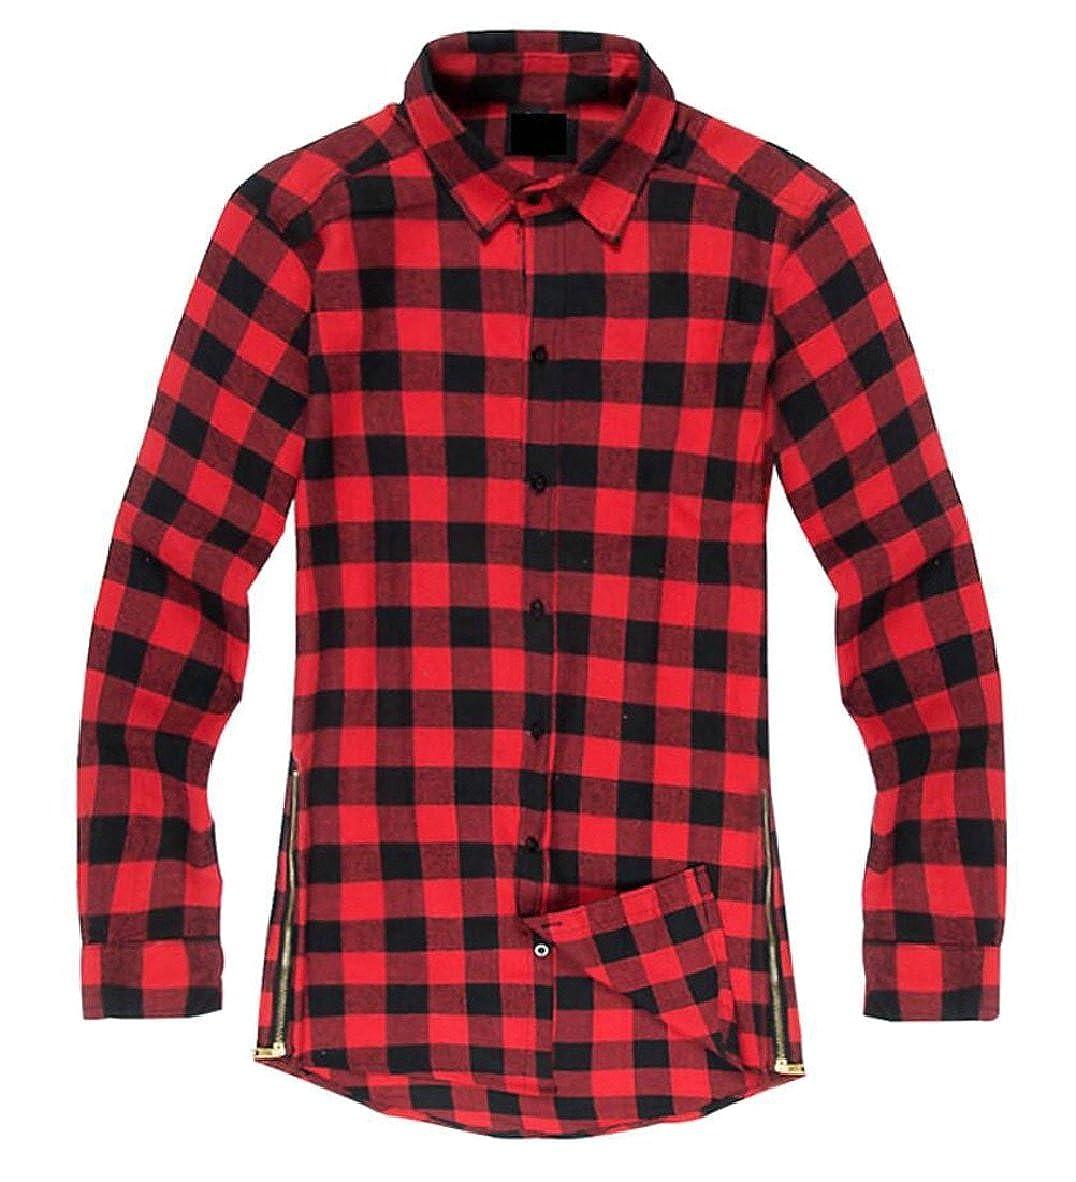 FLCH+YIGE Mens Button Down Long Sleeve Side Zipper Plaid Autumn Loose Shirt